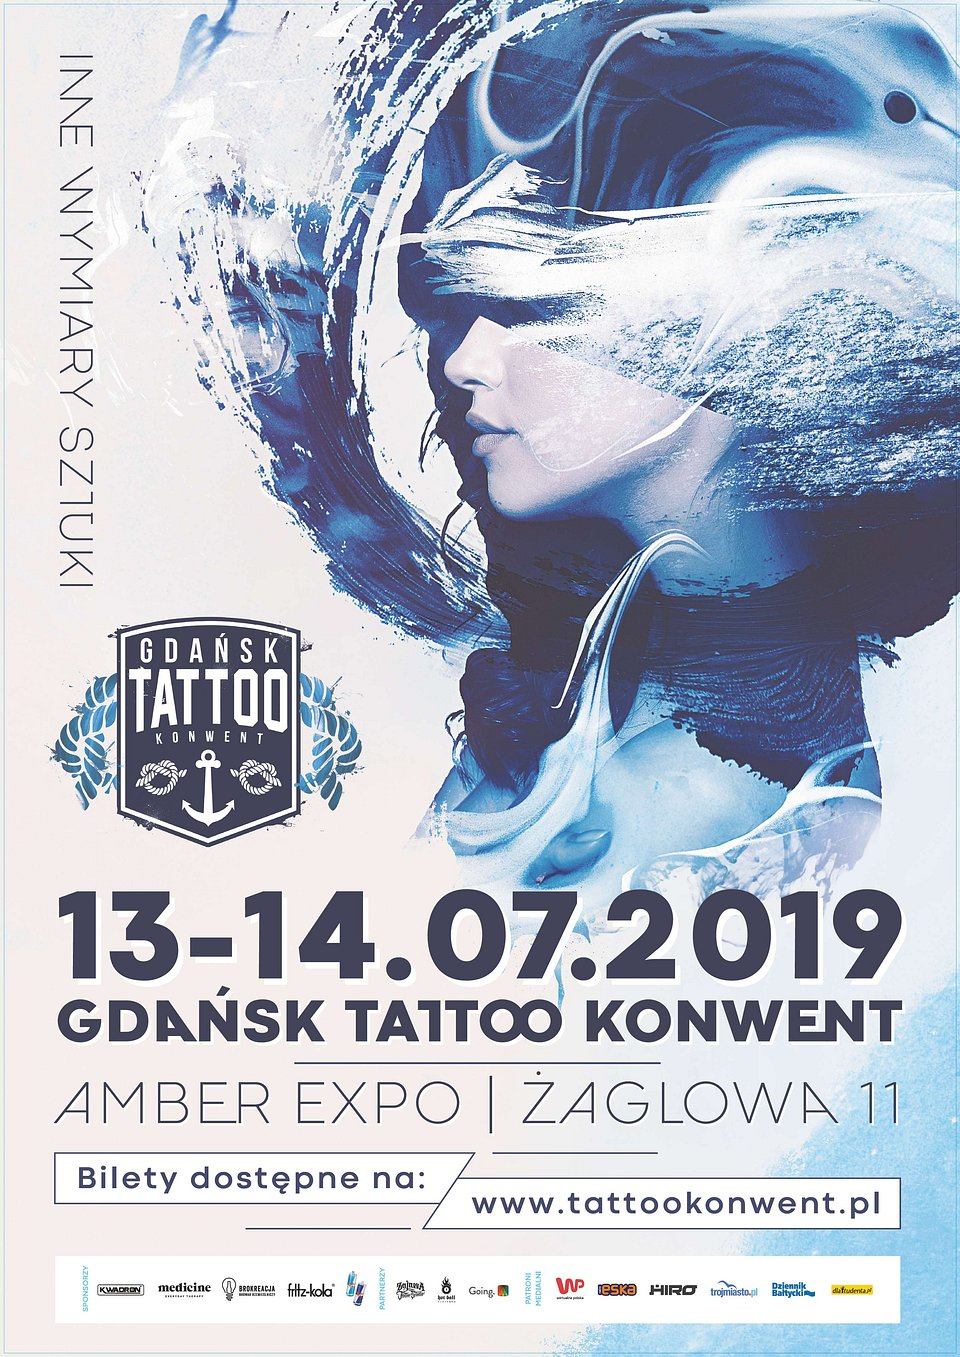 GDANSK_TATTOO_KONWENT_2019_poster.jpg